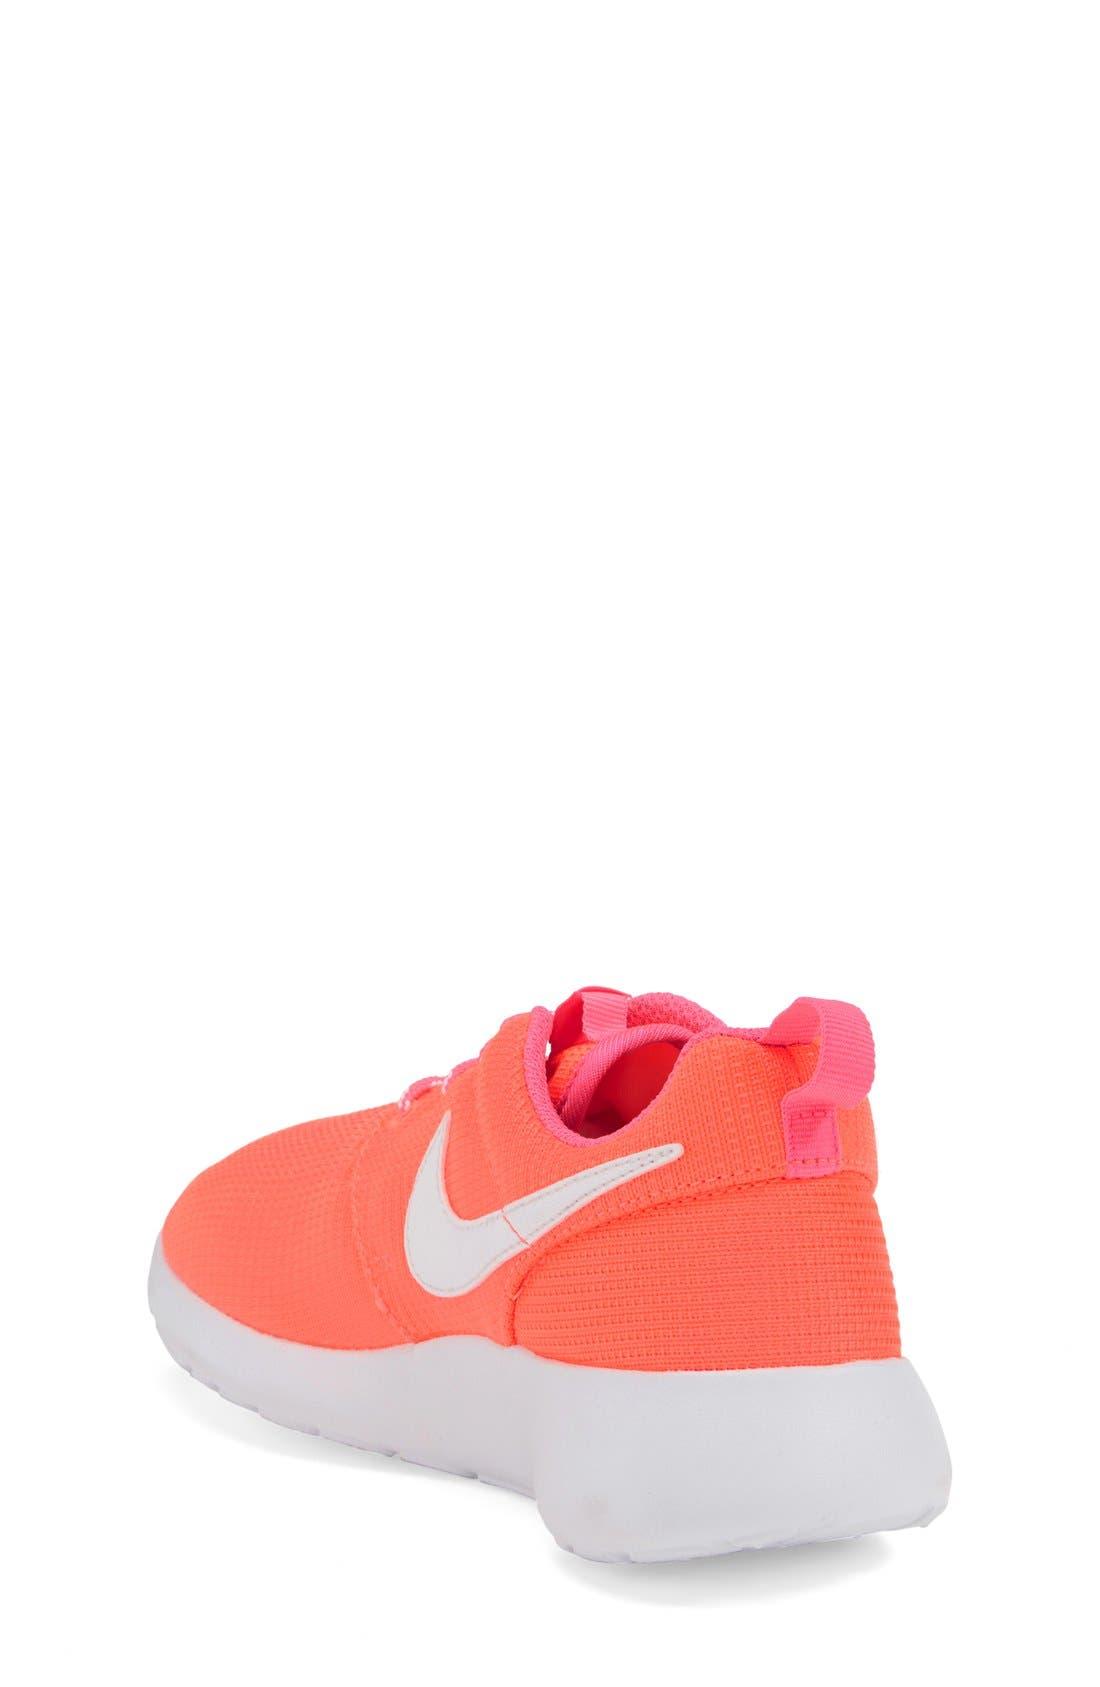 'Roshe Run' Athletic Shoe,                             Alternate thumbnail 184, color,